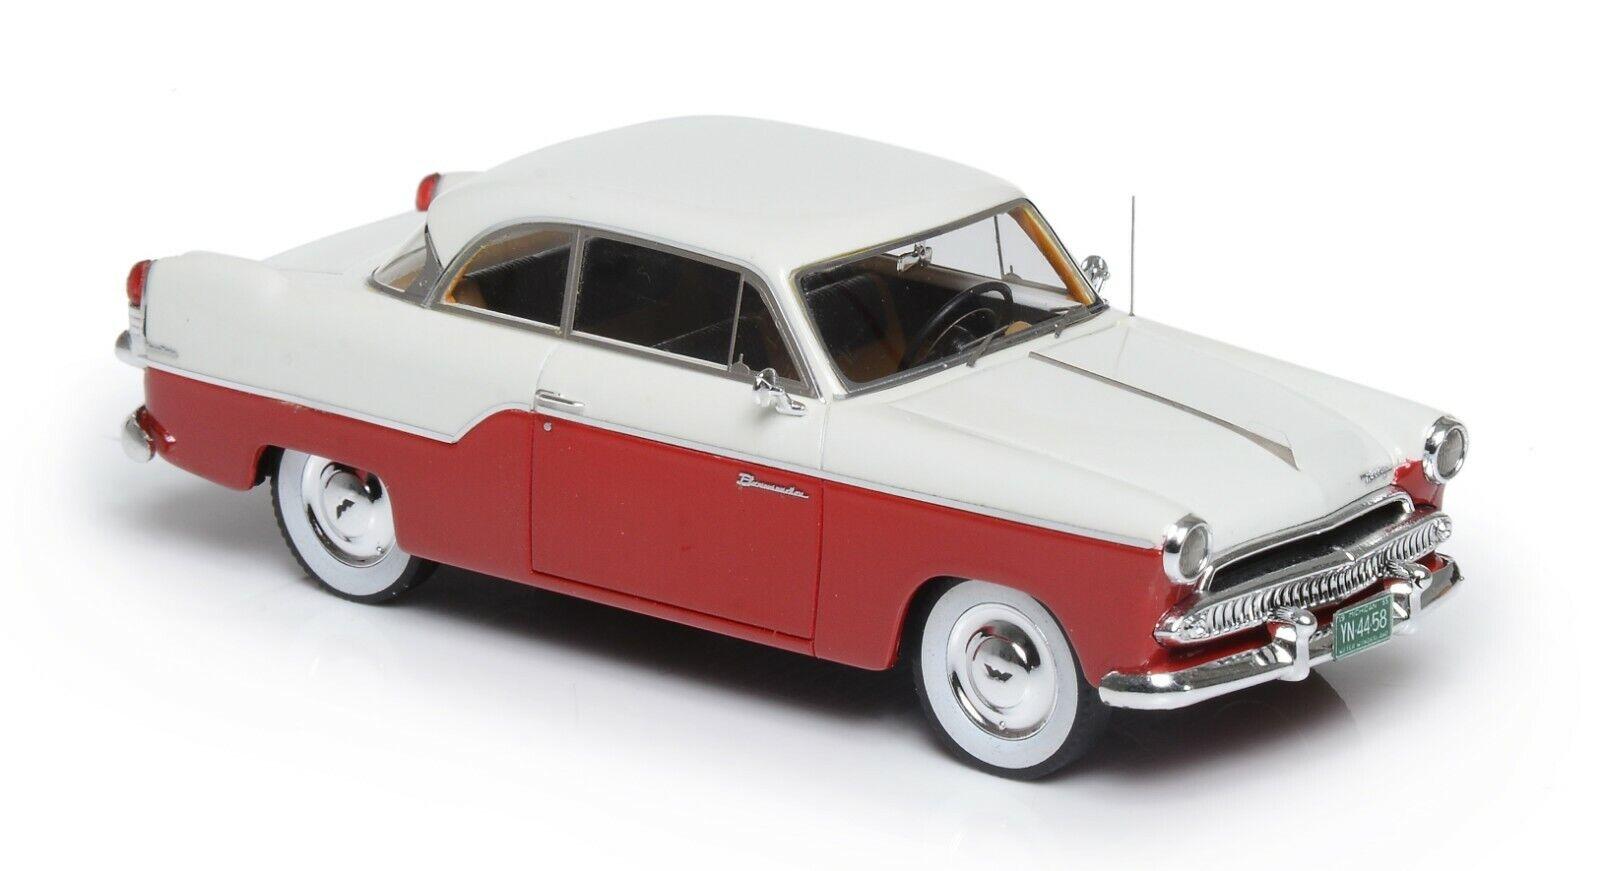 1 43 ESVAL Modell Willys Areo Bermuda 2-dörr Hardtop röd vit 1955